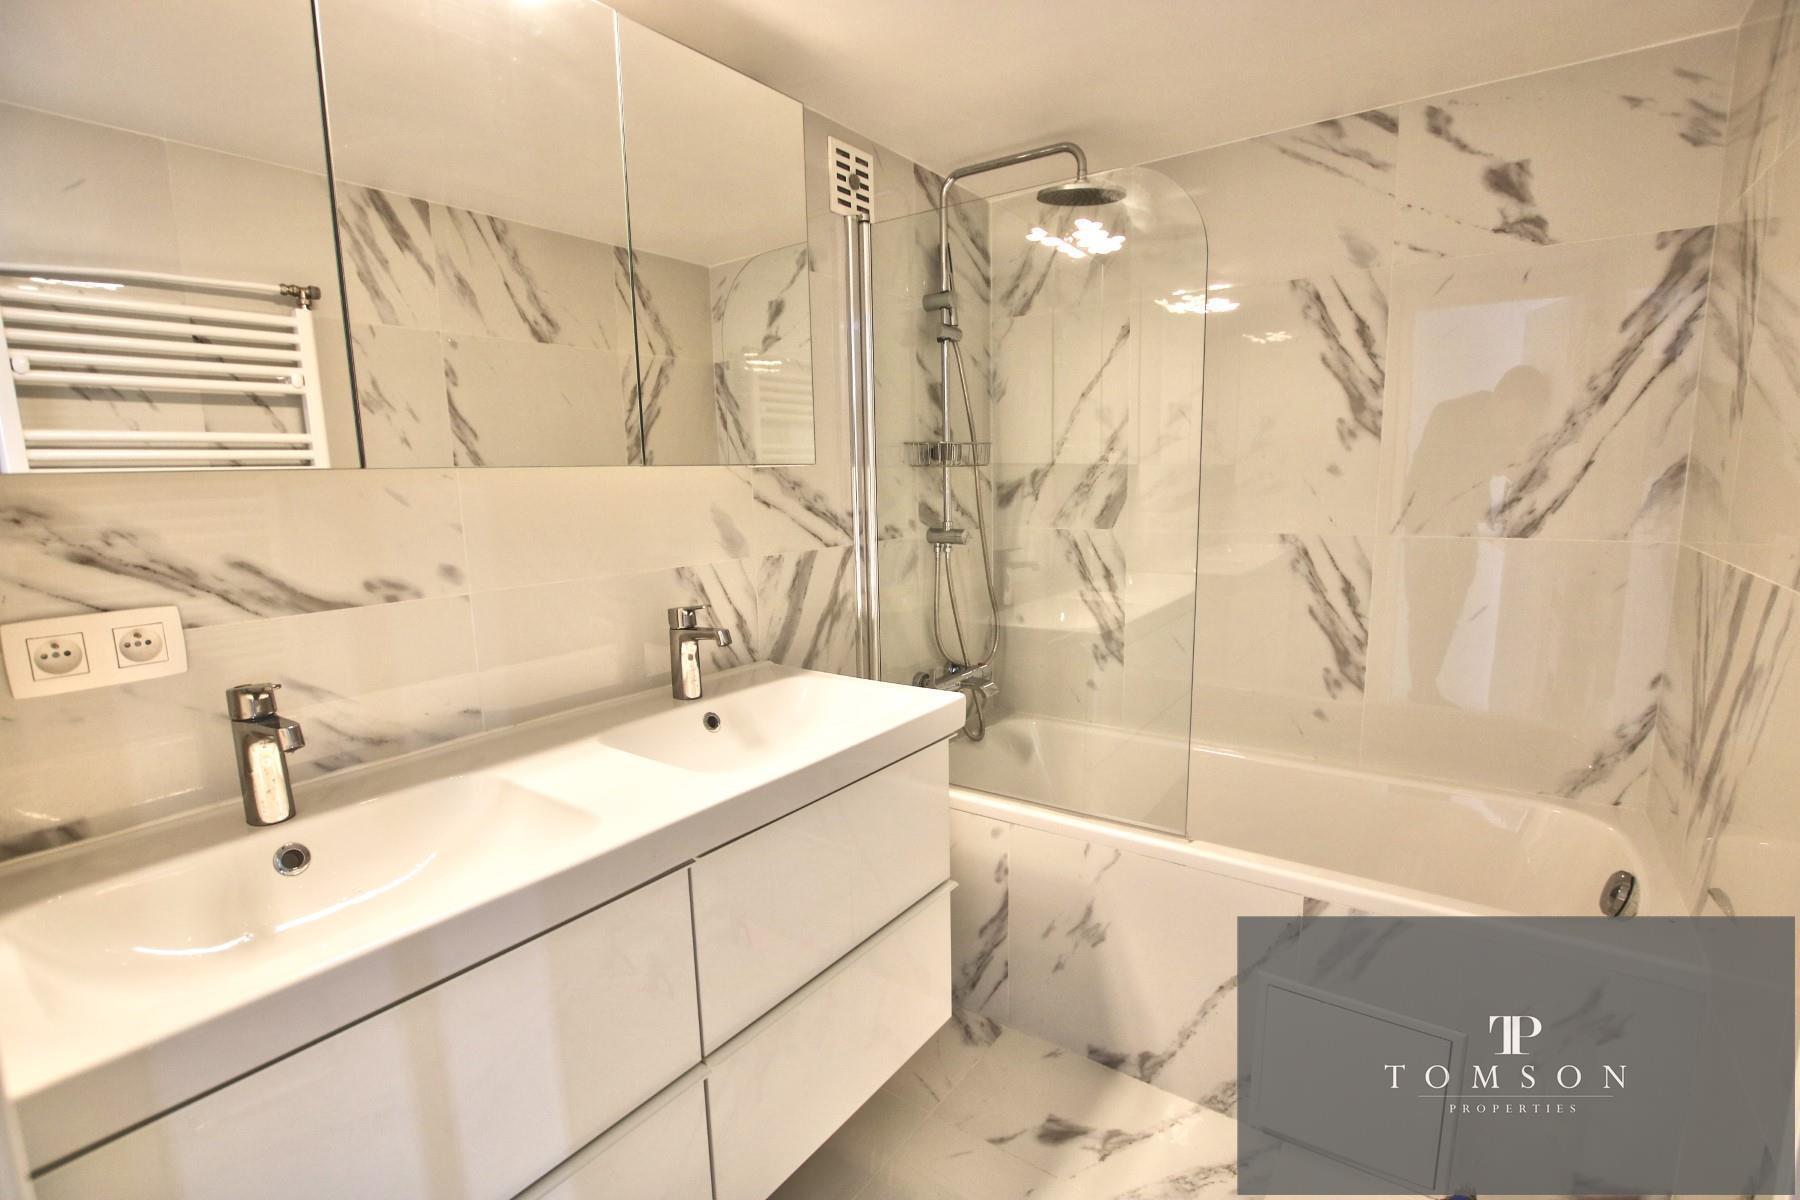 Appartement - Woluwe-Saint-Lambert - #4530512-5